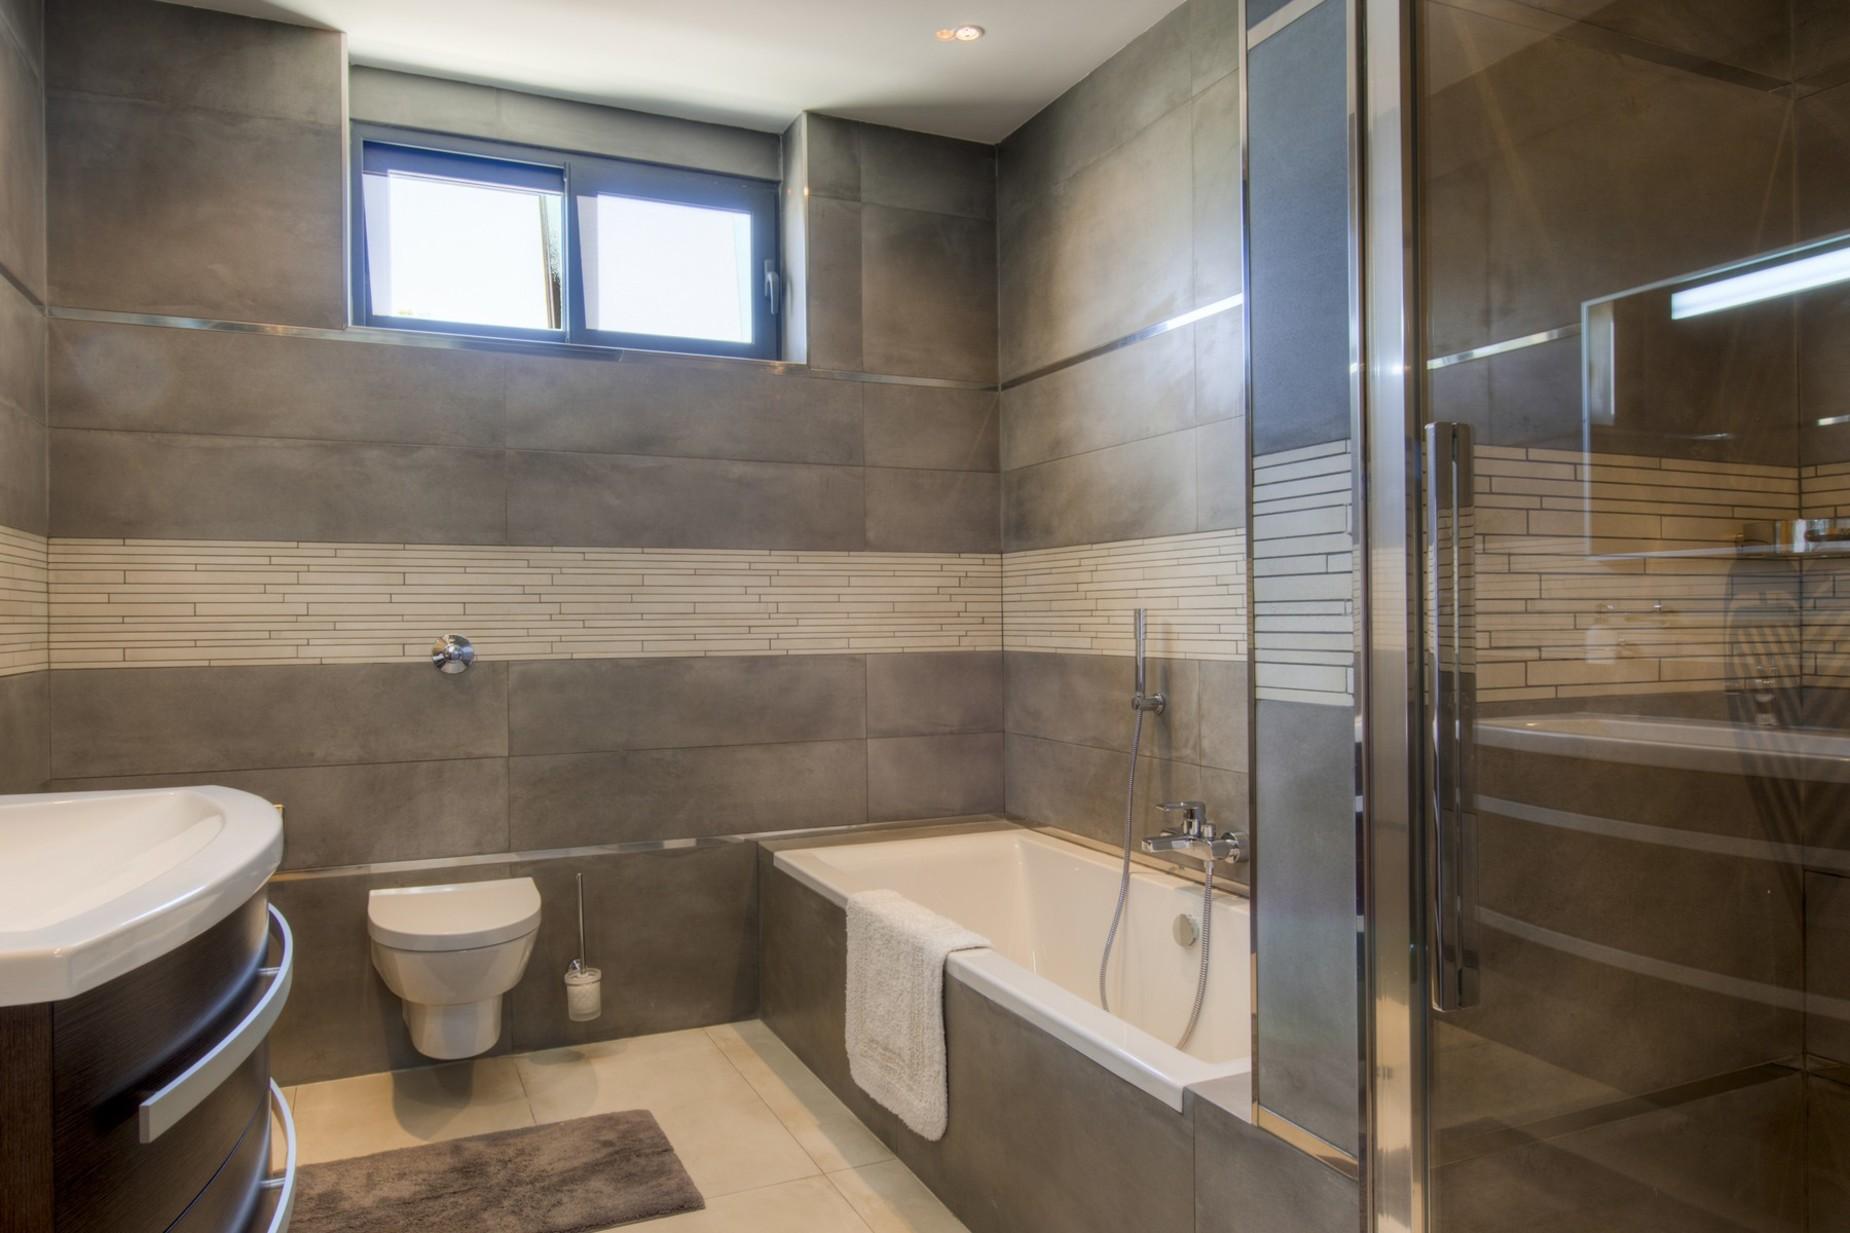 4 bed Villa For Sale in Bahar ic-Caghaq, Bahar ic-Caghaq - thumb 3